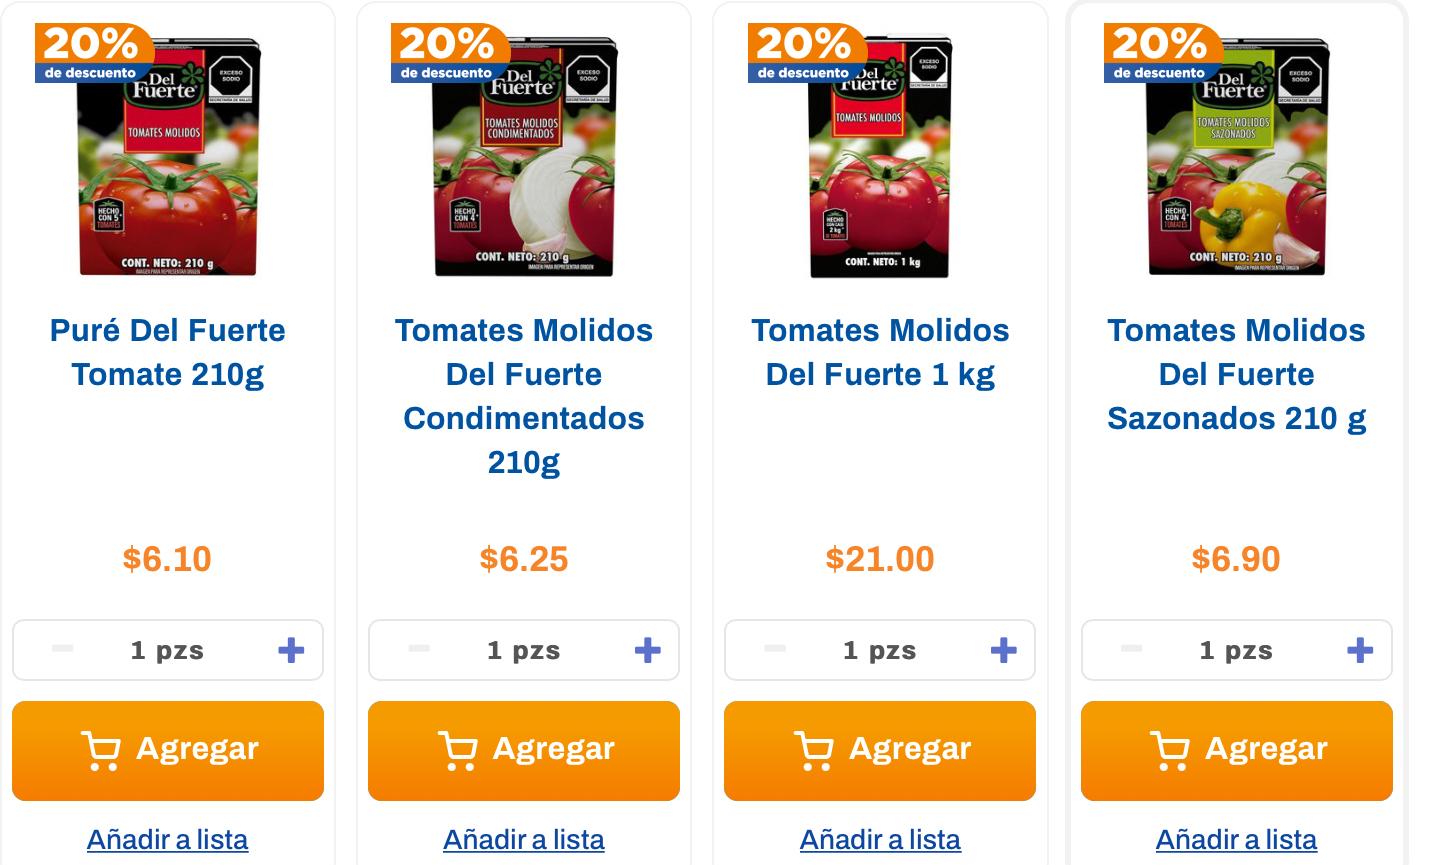 Chedraui 20% descuento puré de tomate del Fuerte y Herdez